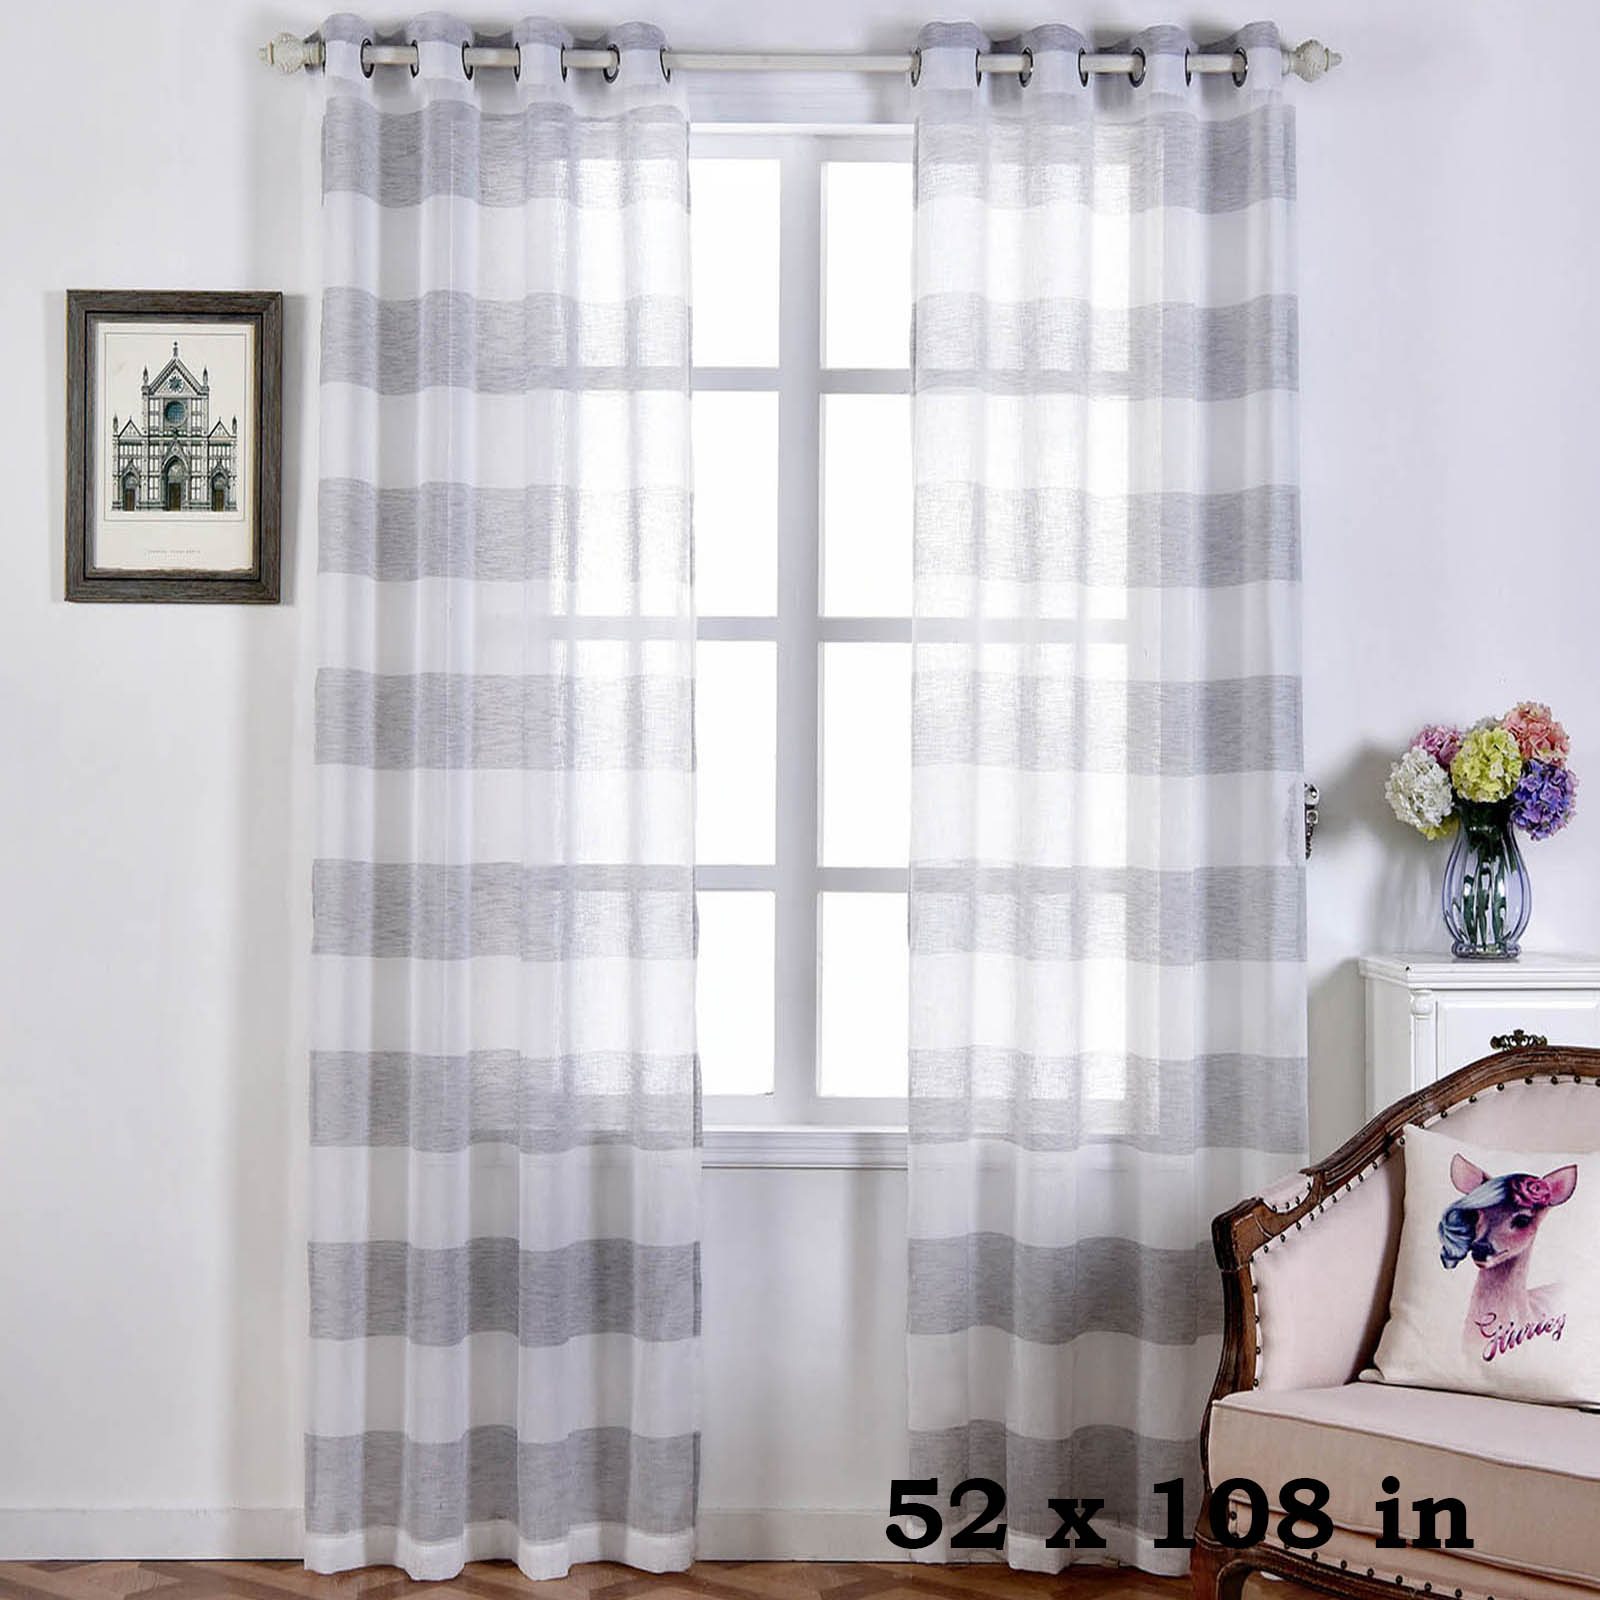 "Details About 2 Pcs White And Silver 52"" X 108"" Faux Linen Sheer Stripe  Window Curtains Drapes regarding Heavy Faux Linen Single Curtain Panels (Image 3 of 20)"